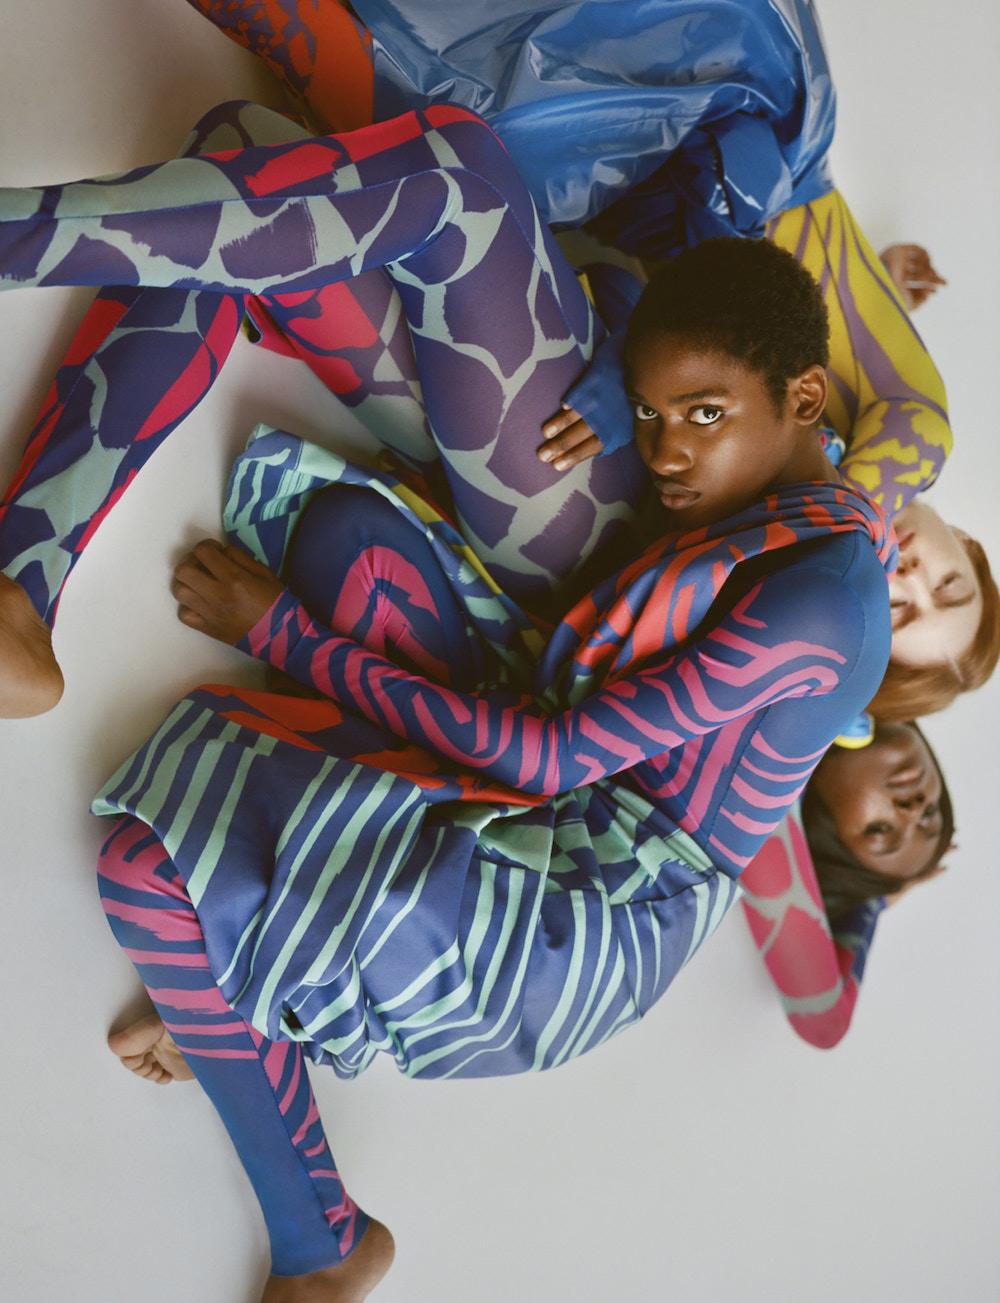 Models in printed clothing